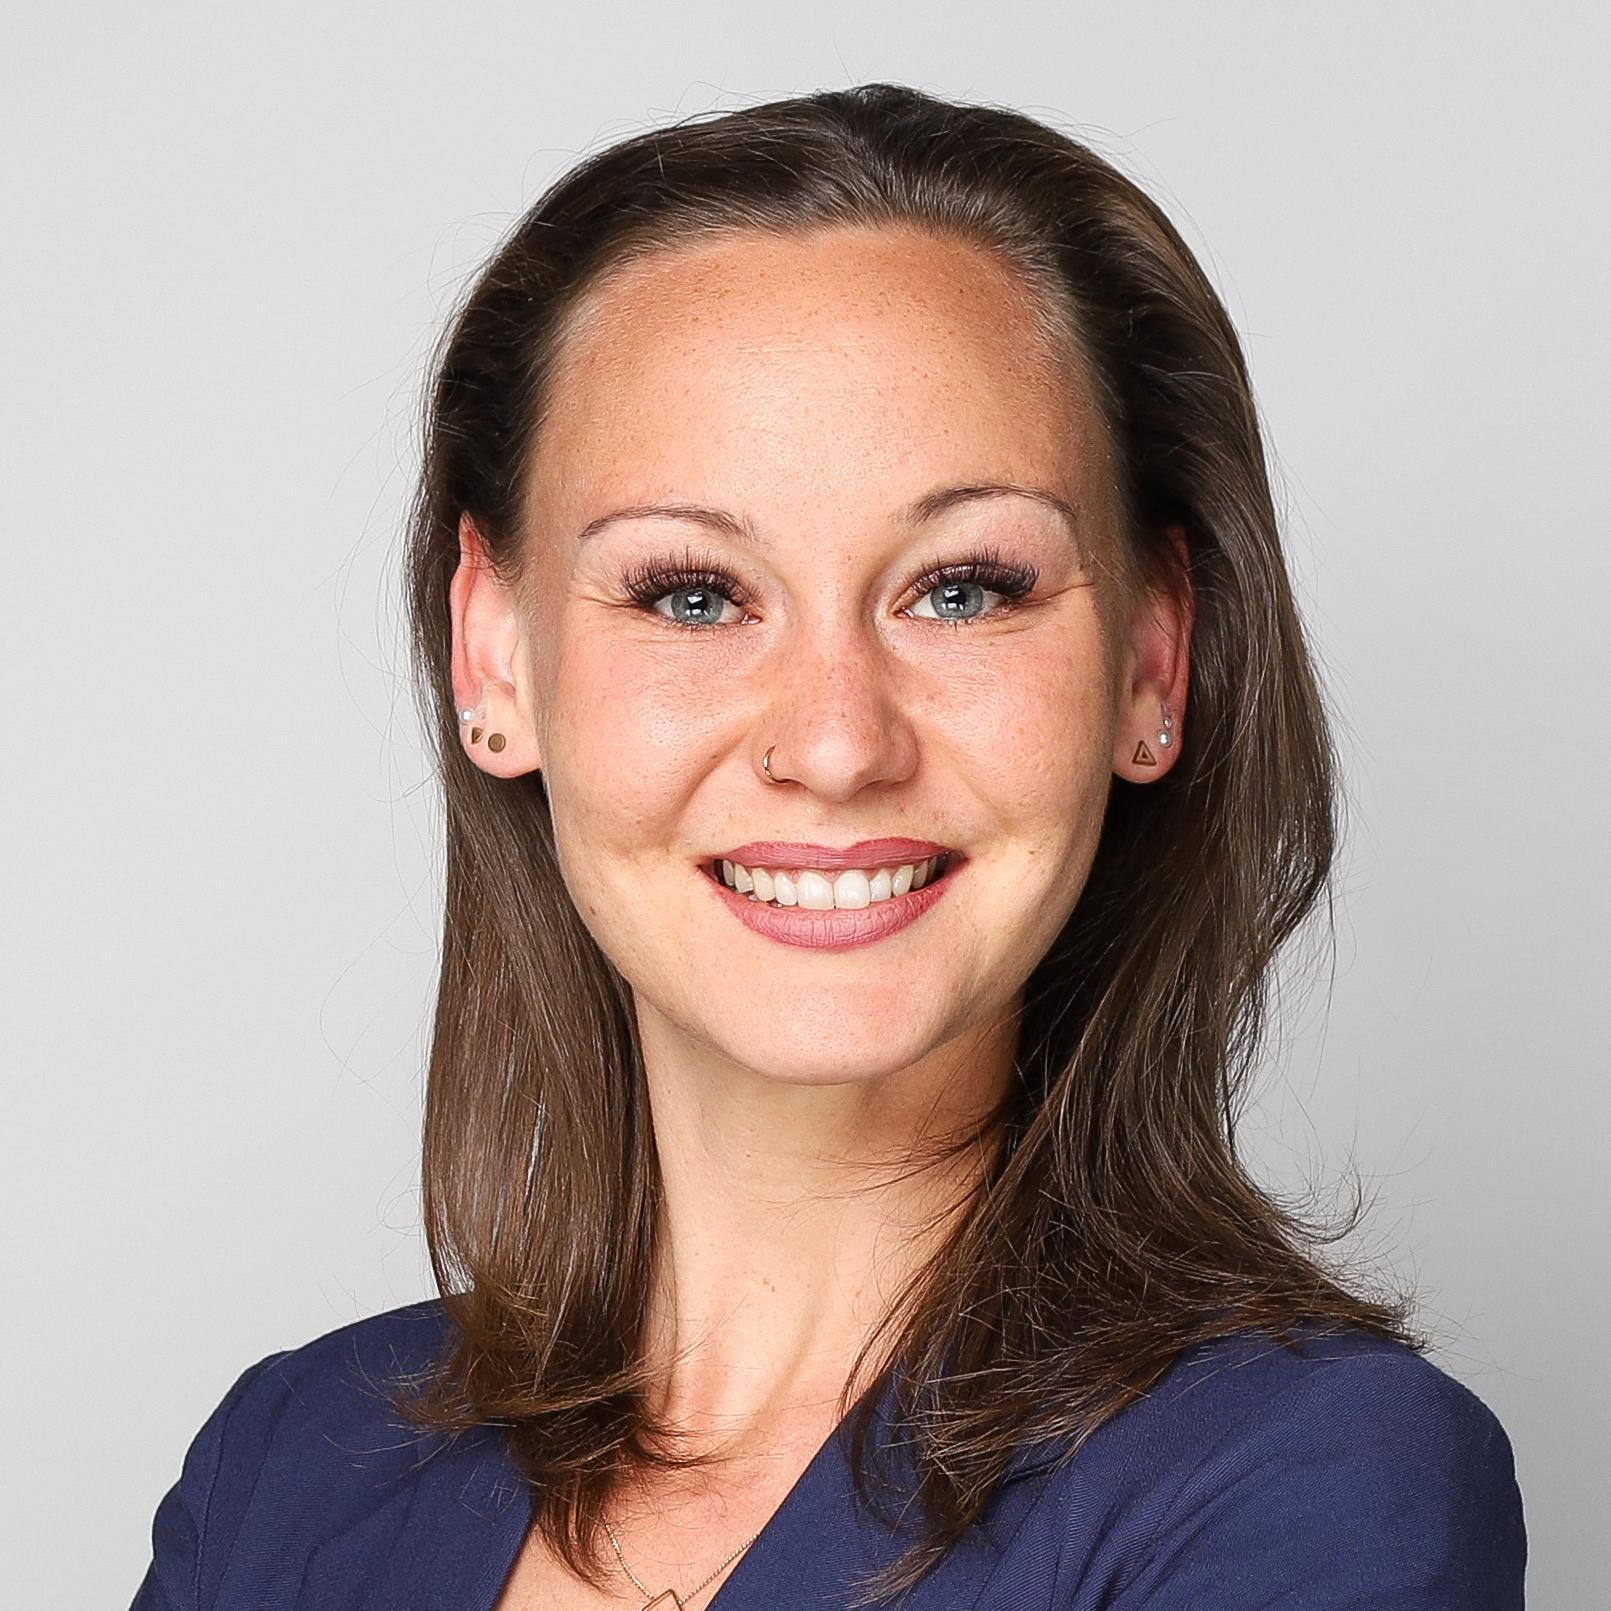 Joana Nina Ramsteck